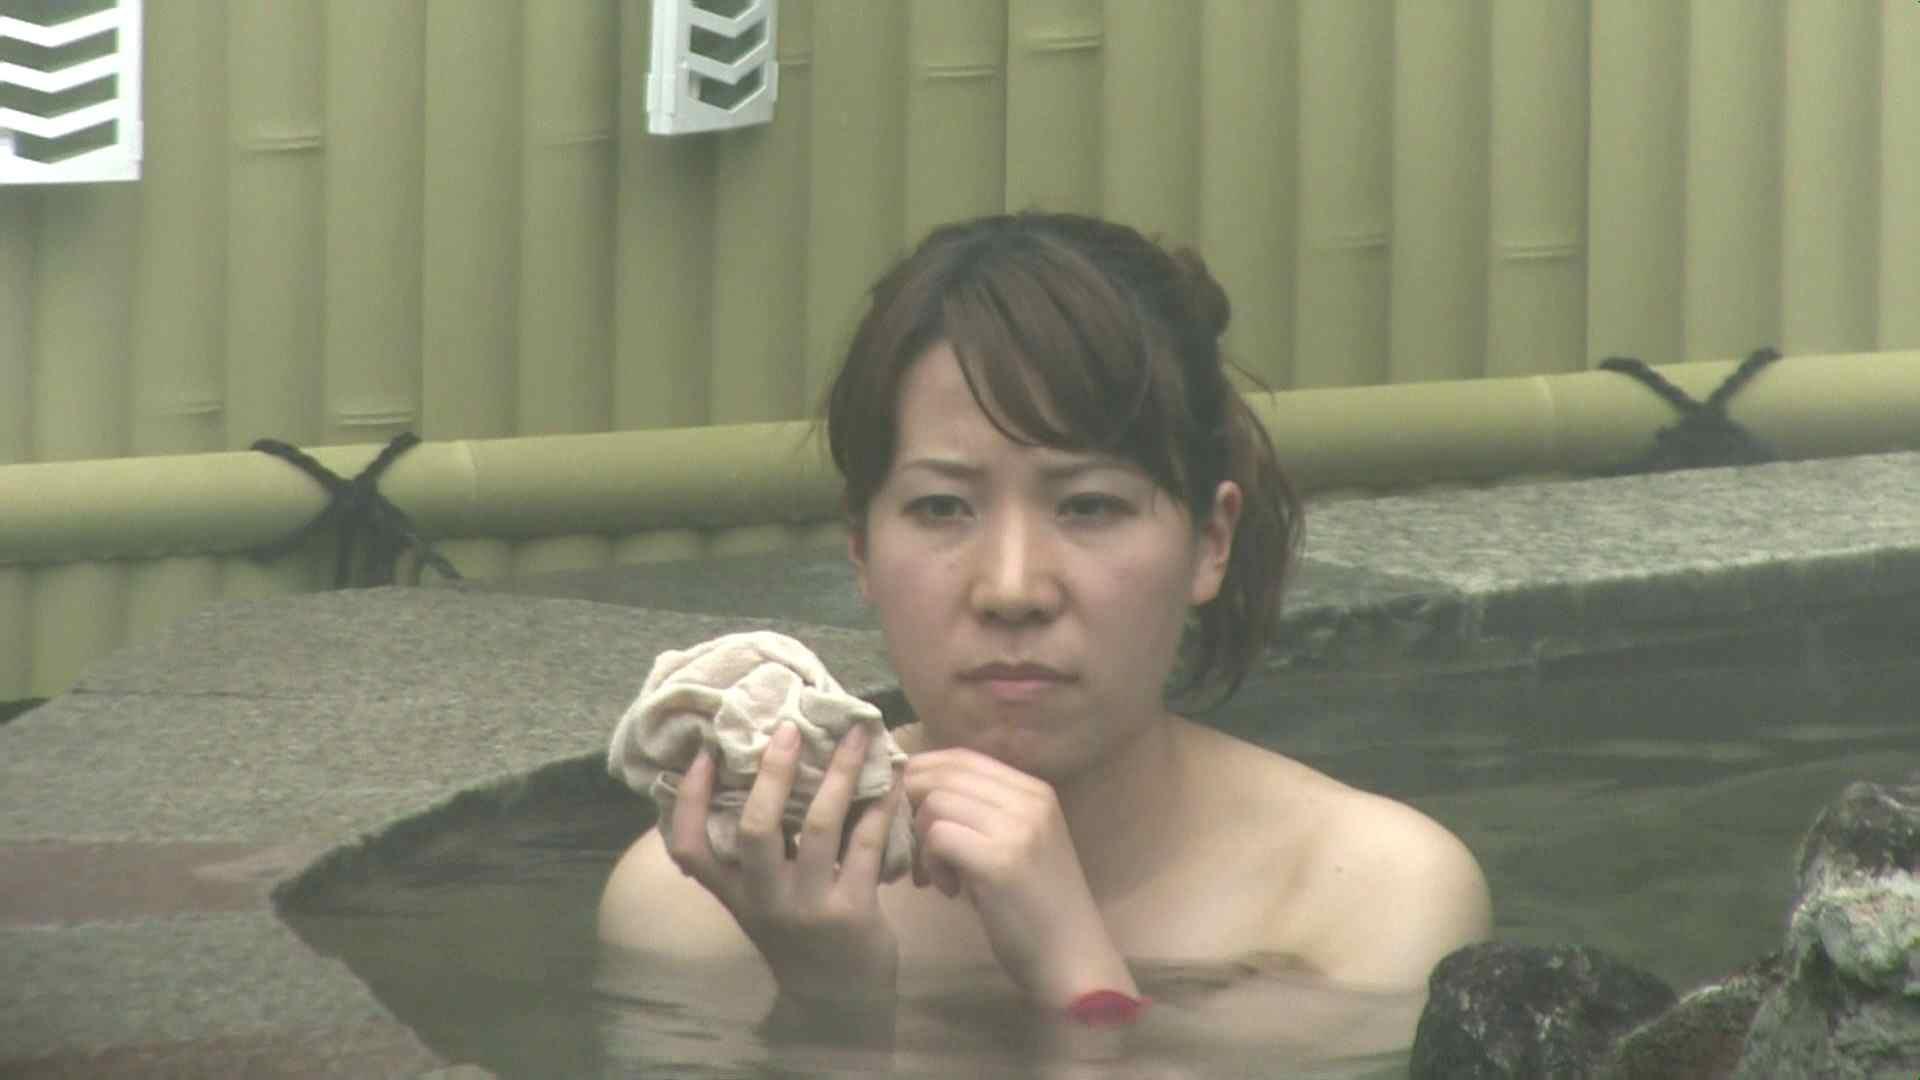 Aquaな露天風呂Vol.35【VIP】 0 | 0  105連発 47